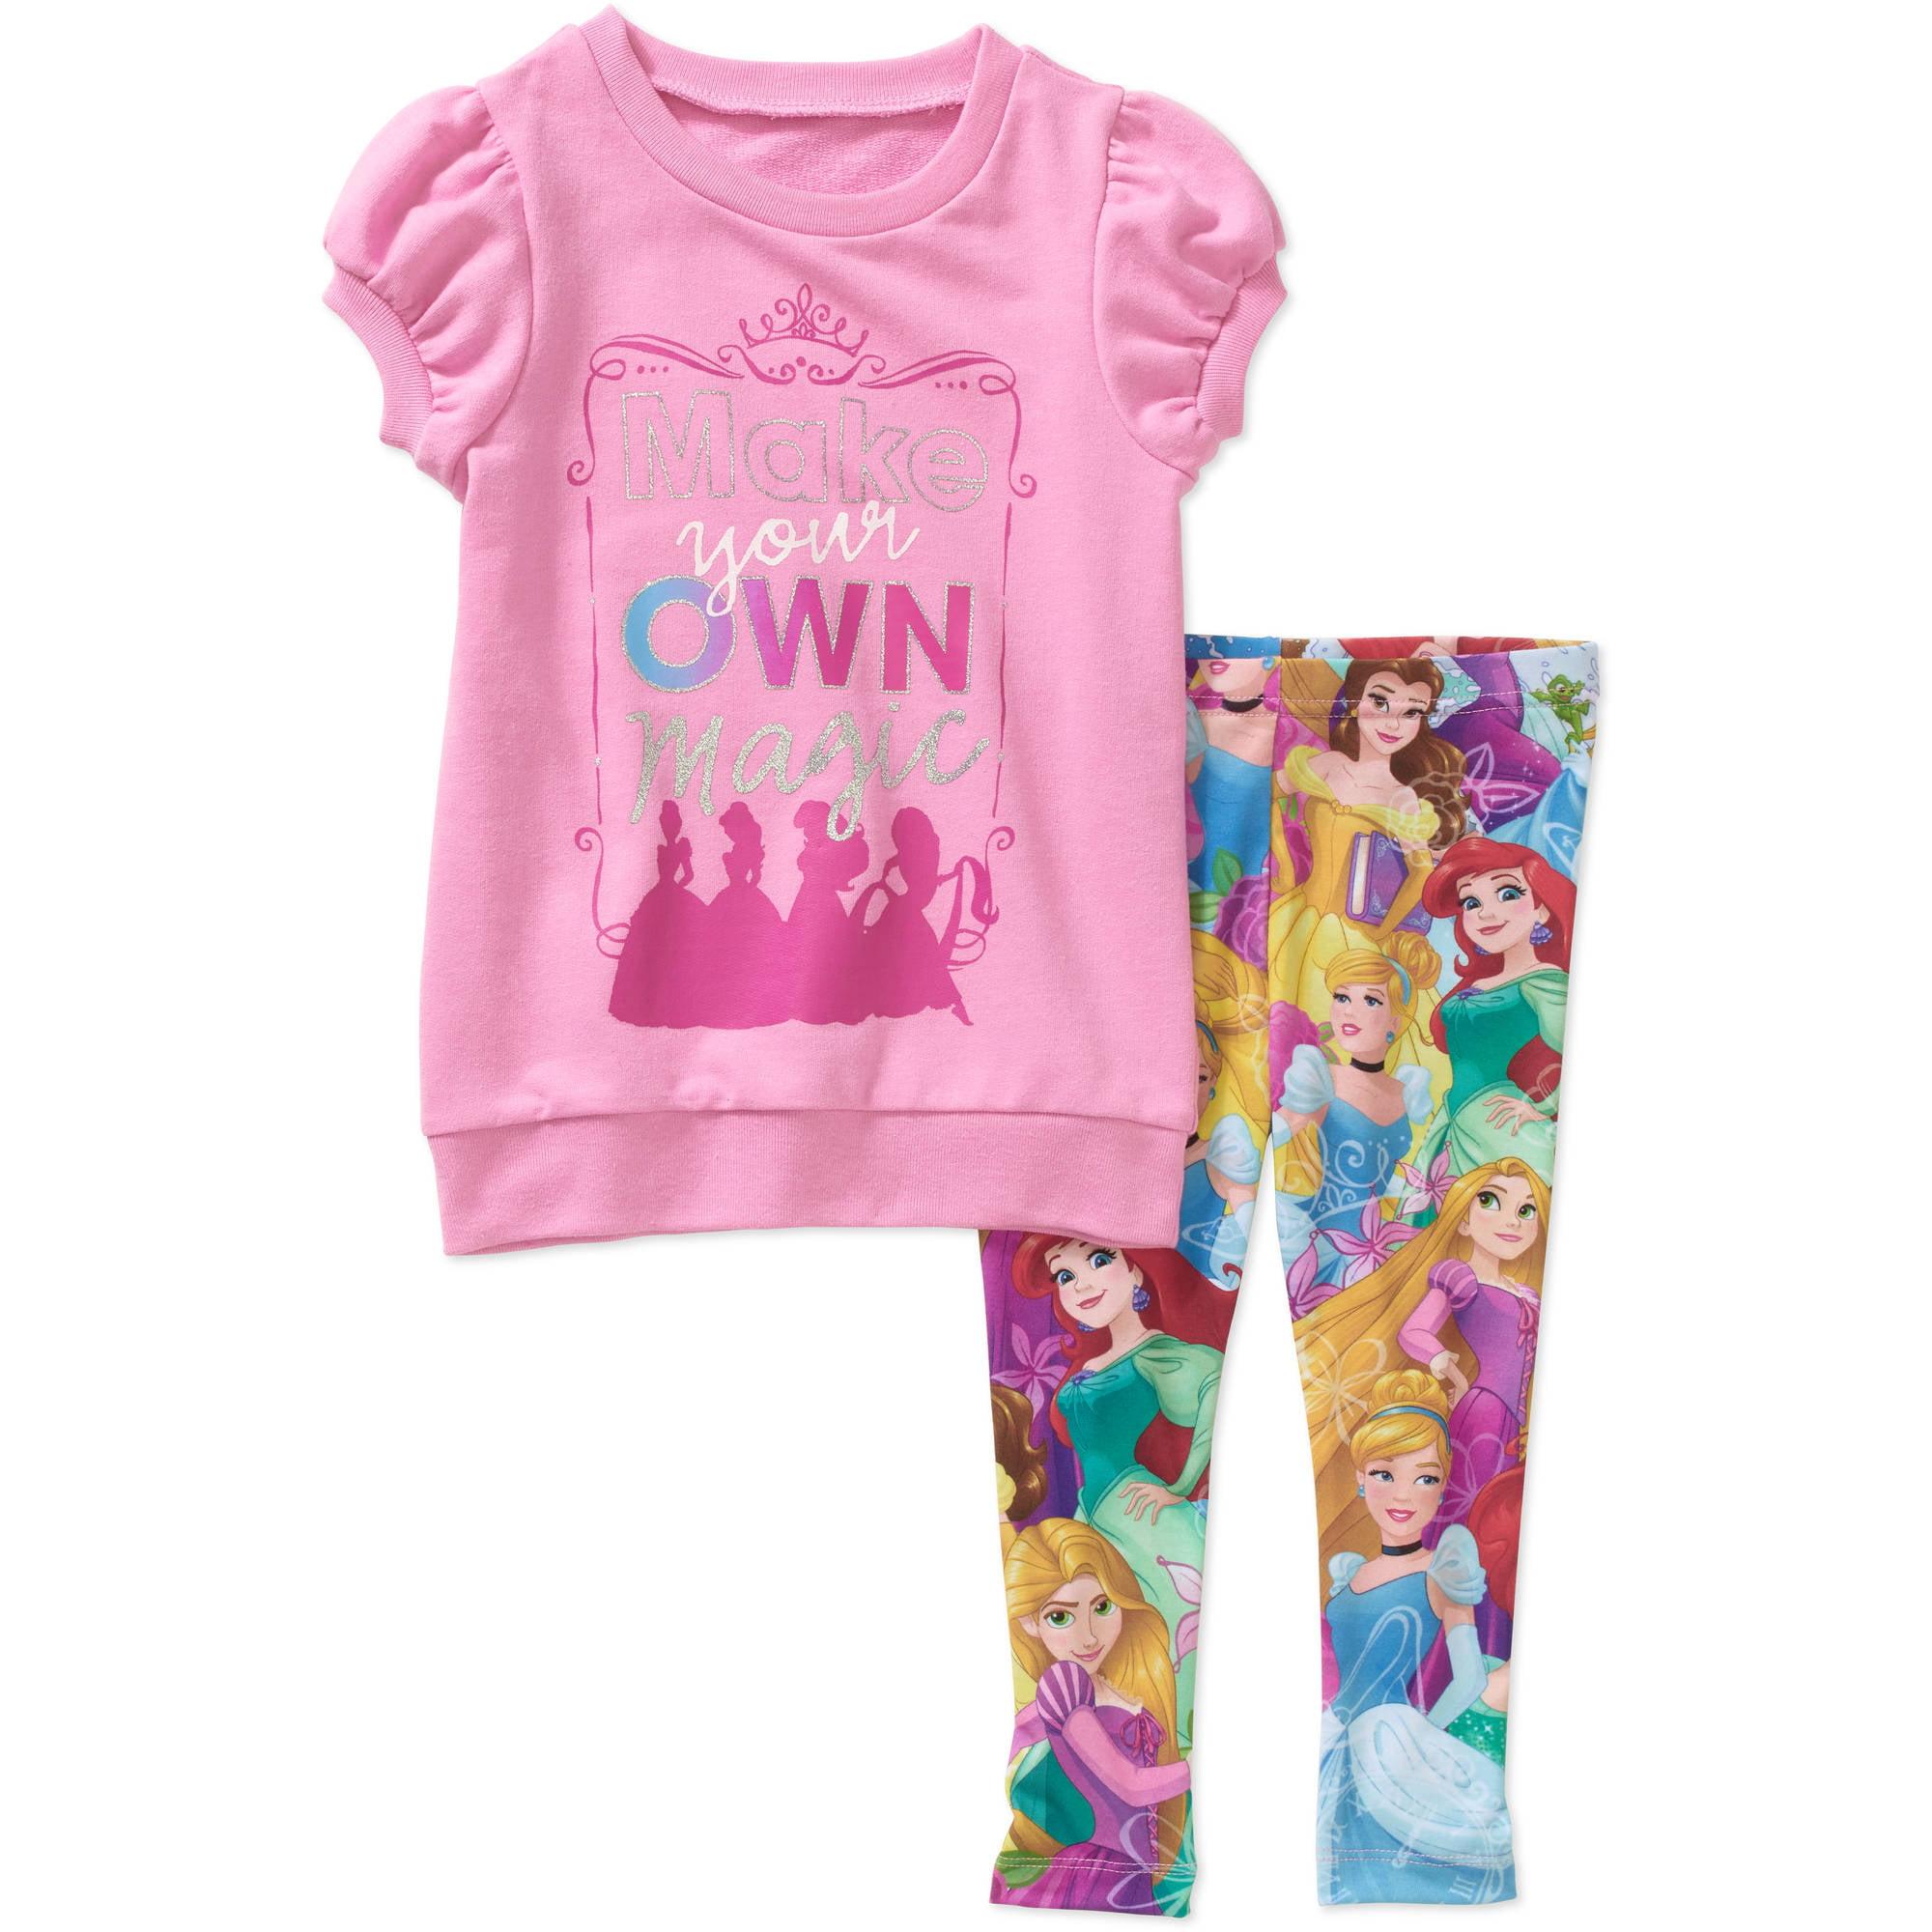 Disney Princess Toddler Girl Knit Tunic And Leggings Outfit Set